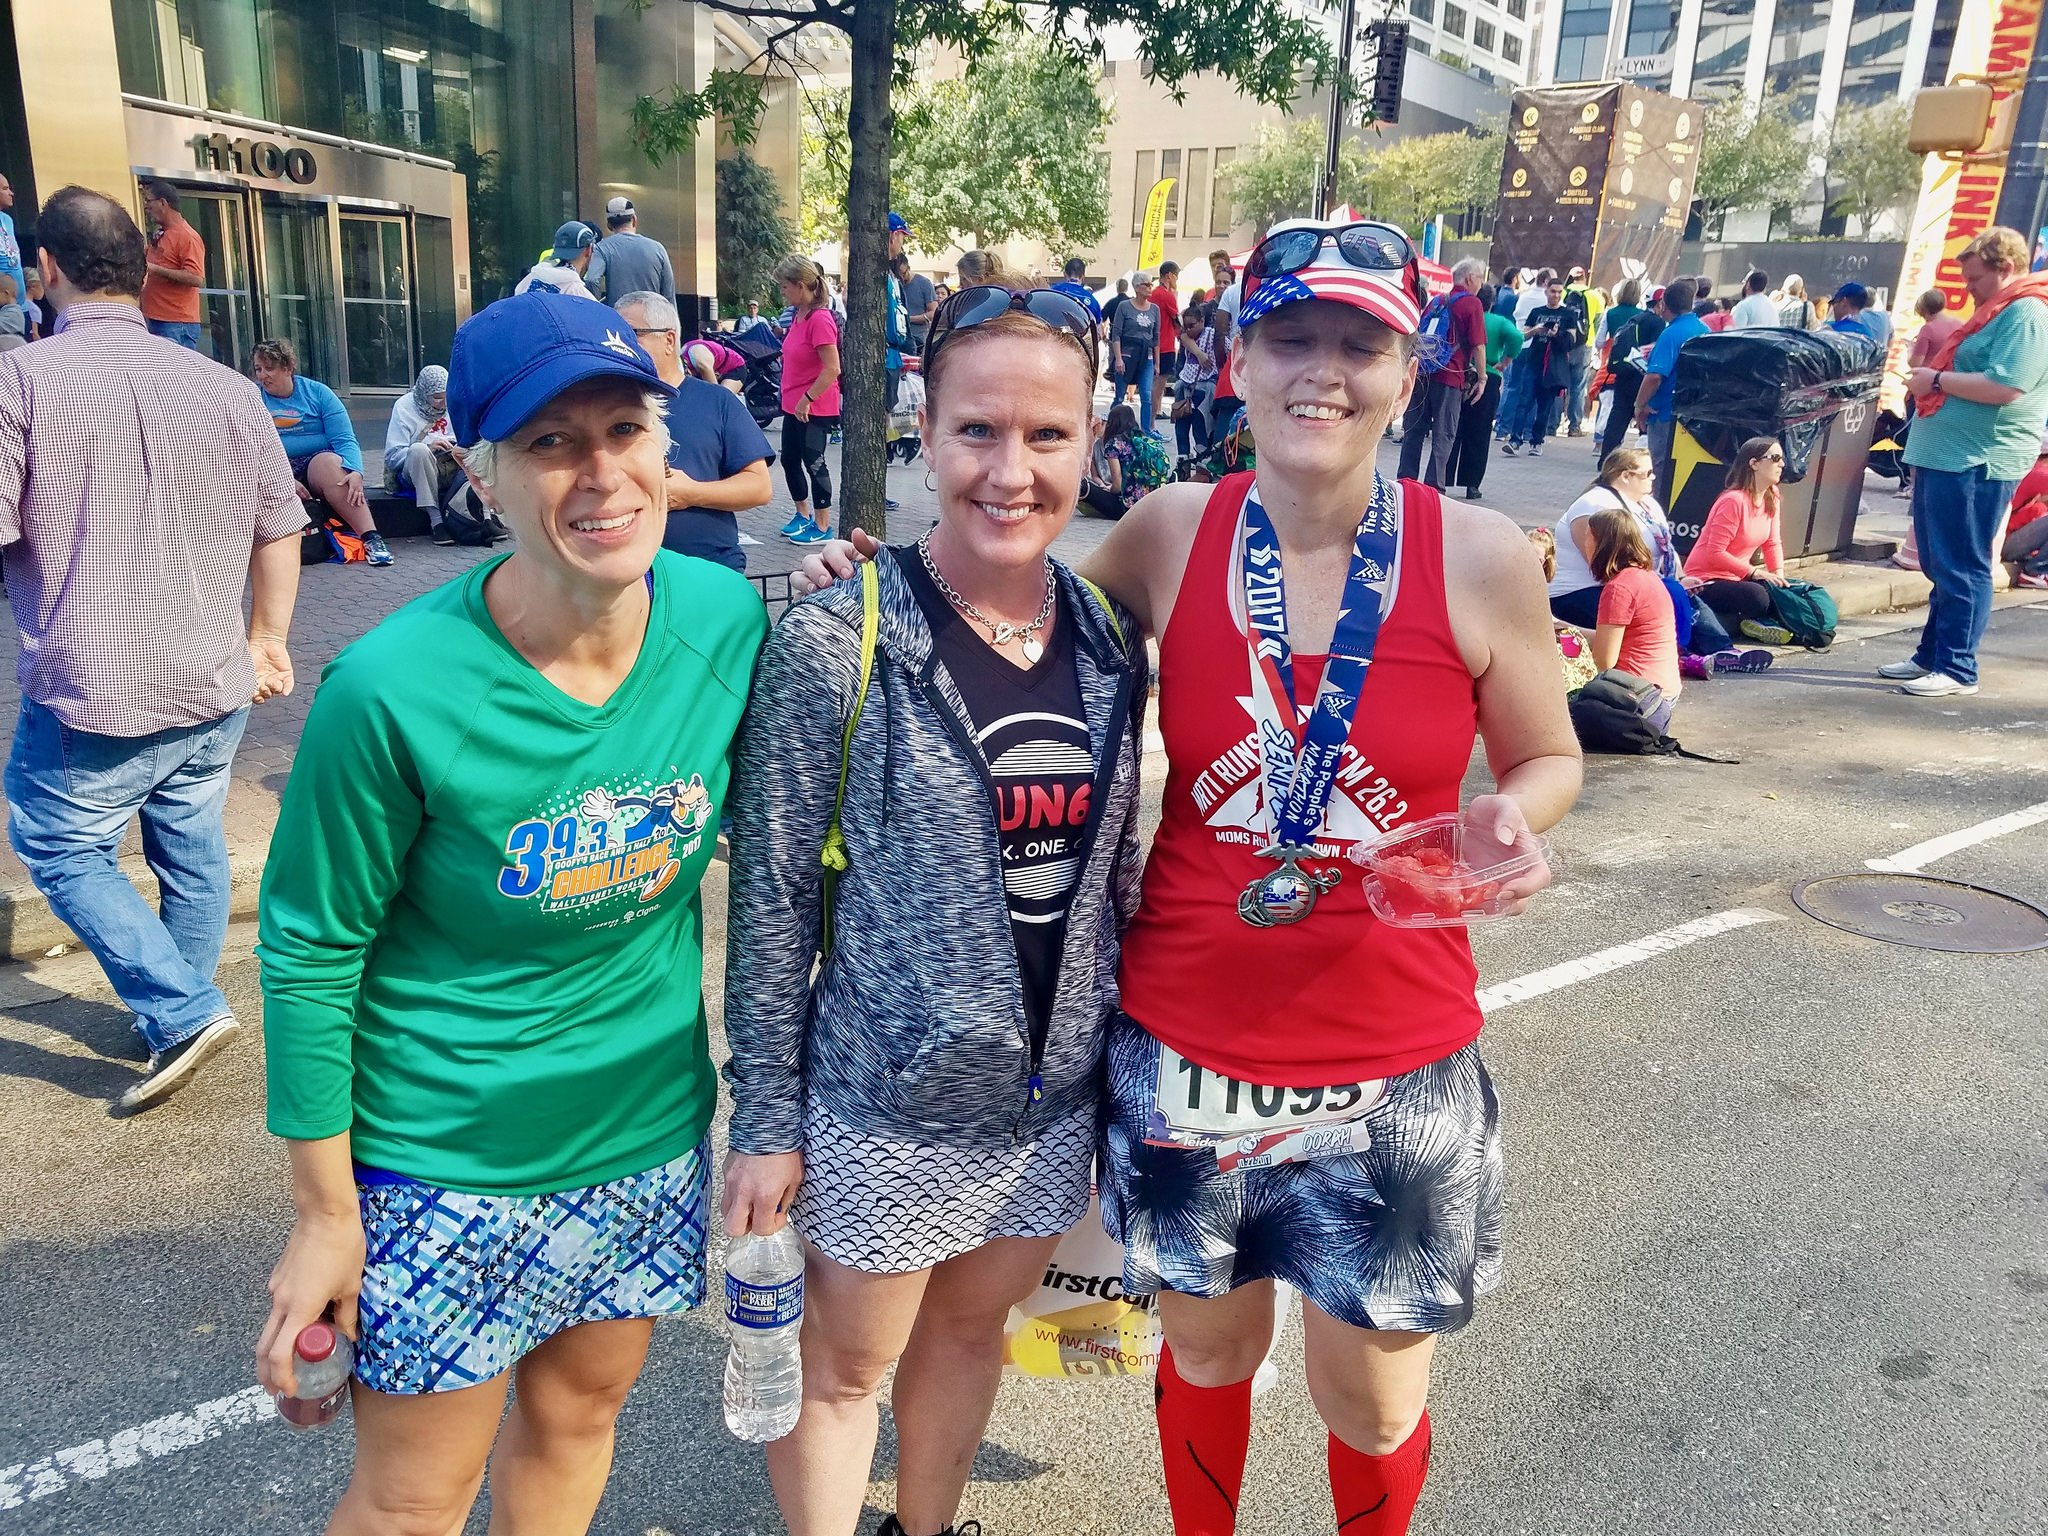 Marine Corps Marathon 2017 friends finish